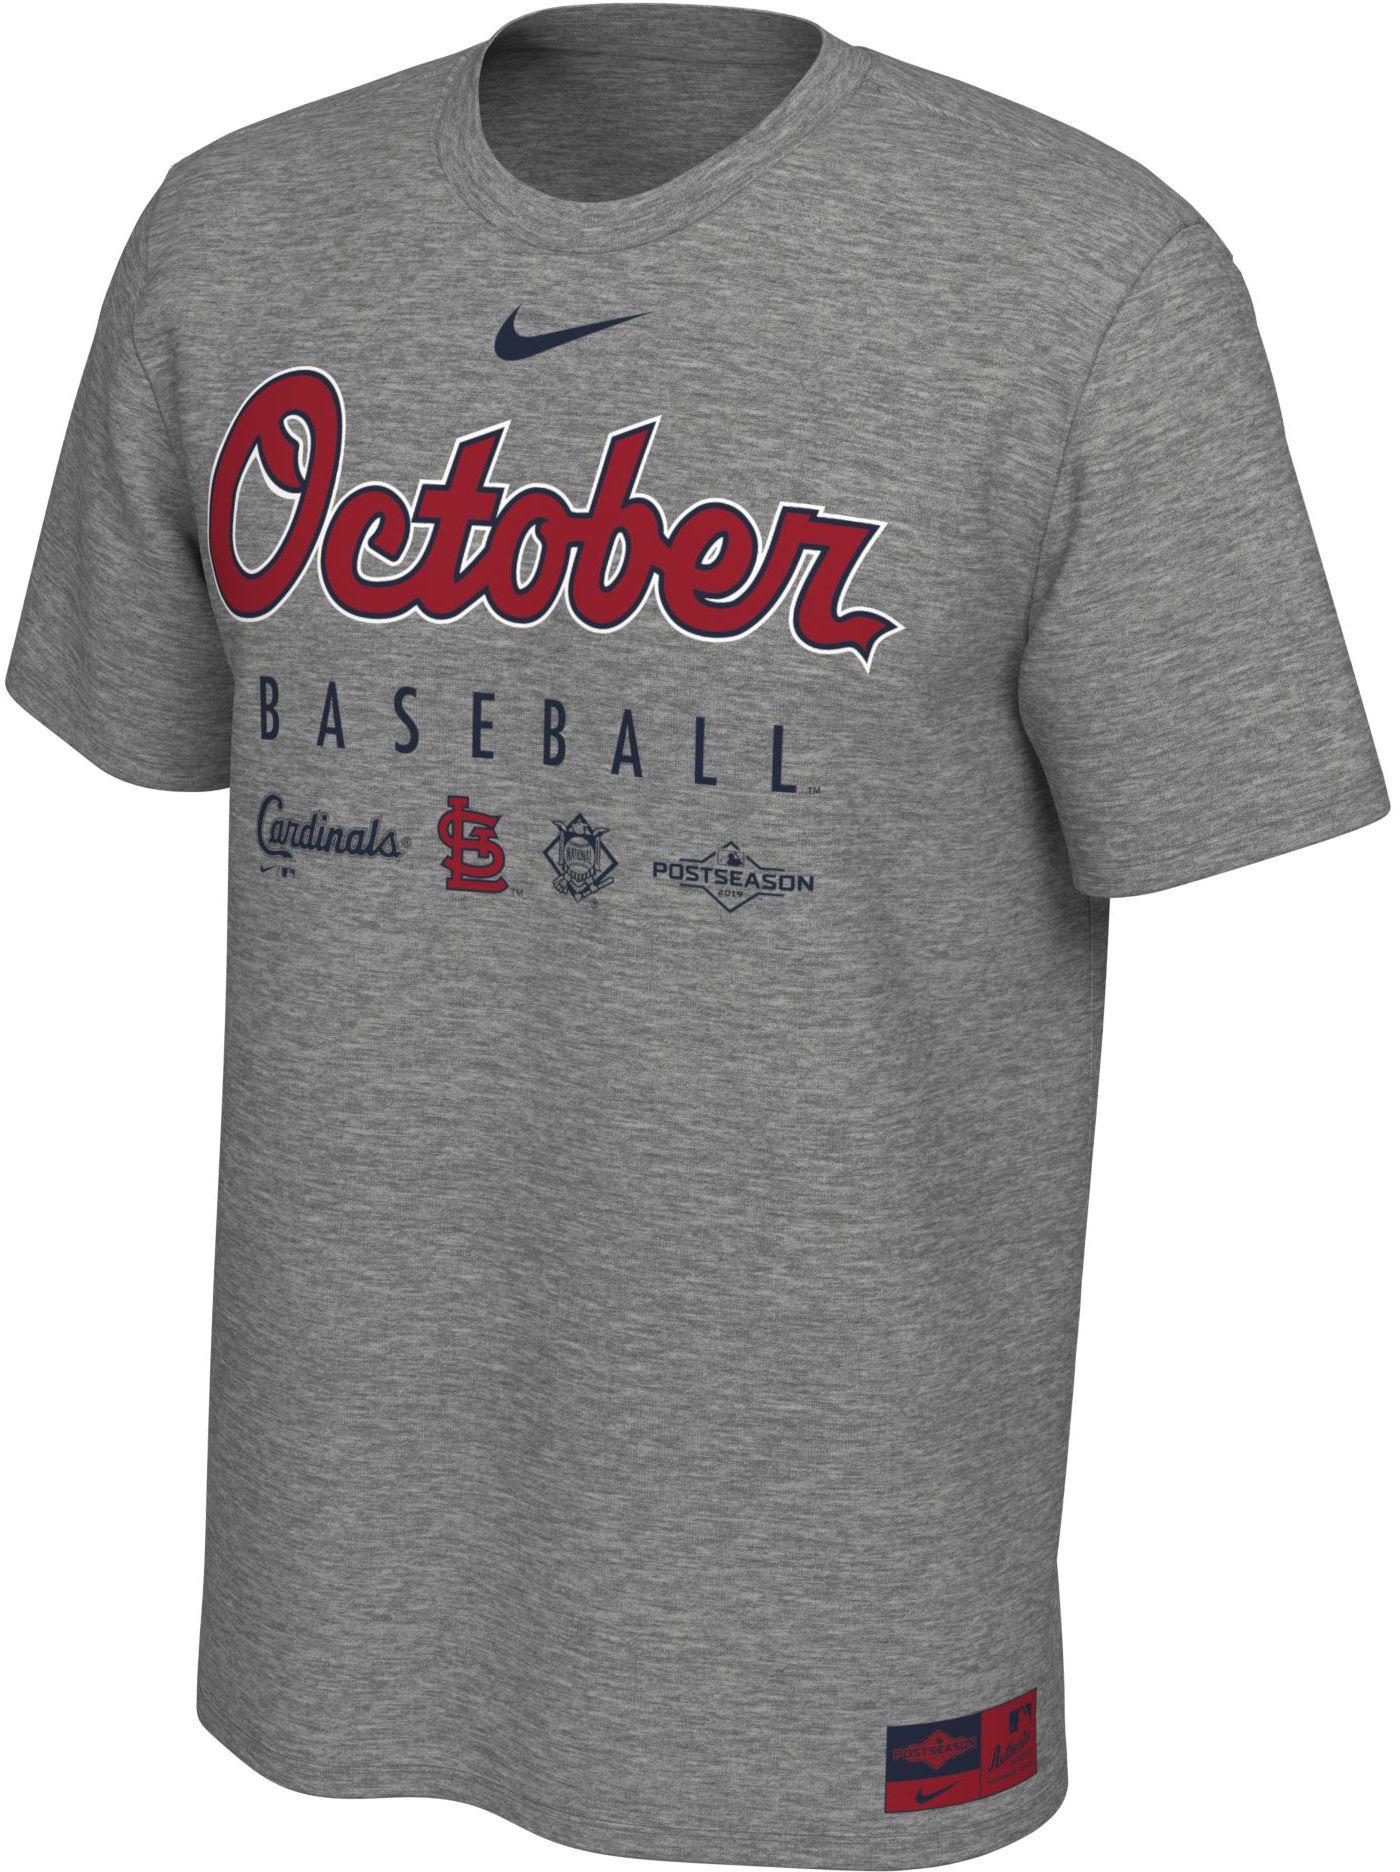 "Nike Men's St. Louis Cardinals 2019 MLB Postseason ""October Baseball"" T-Shirt"